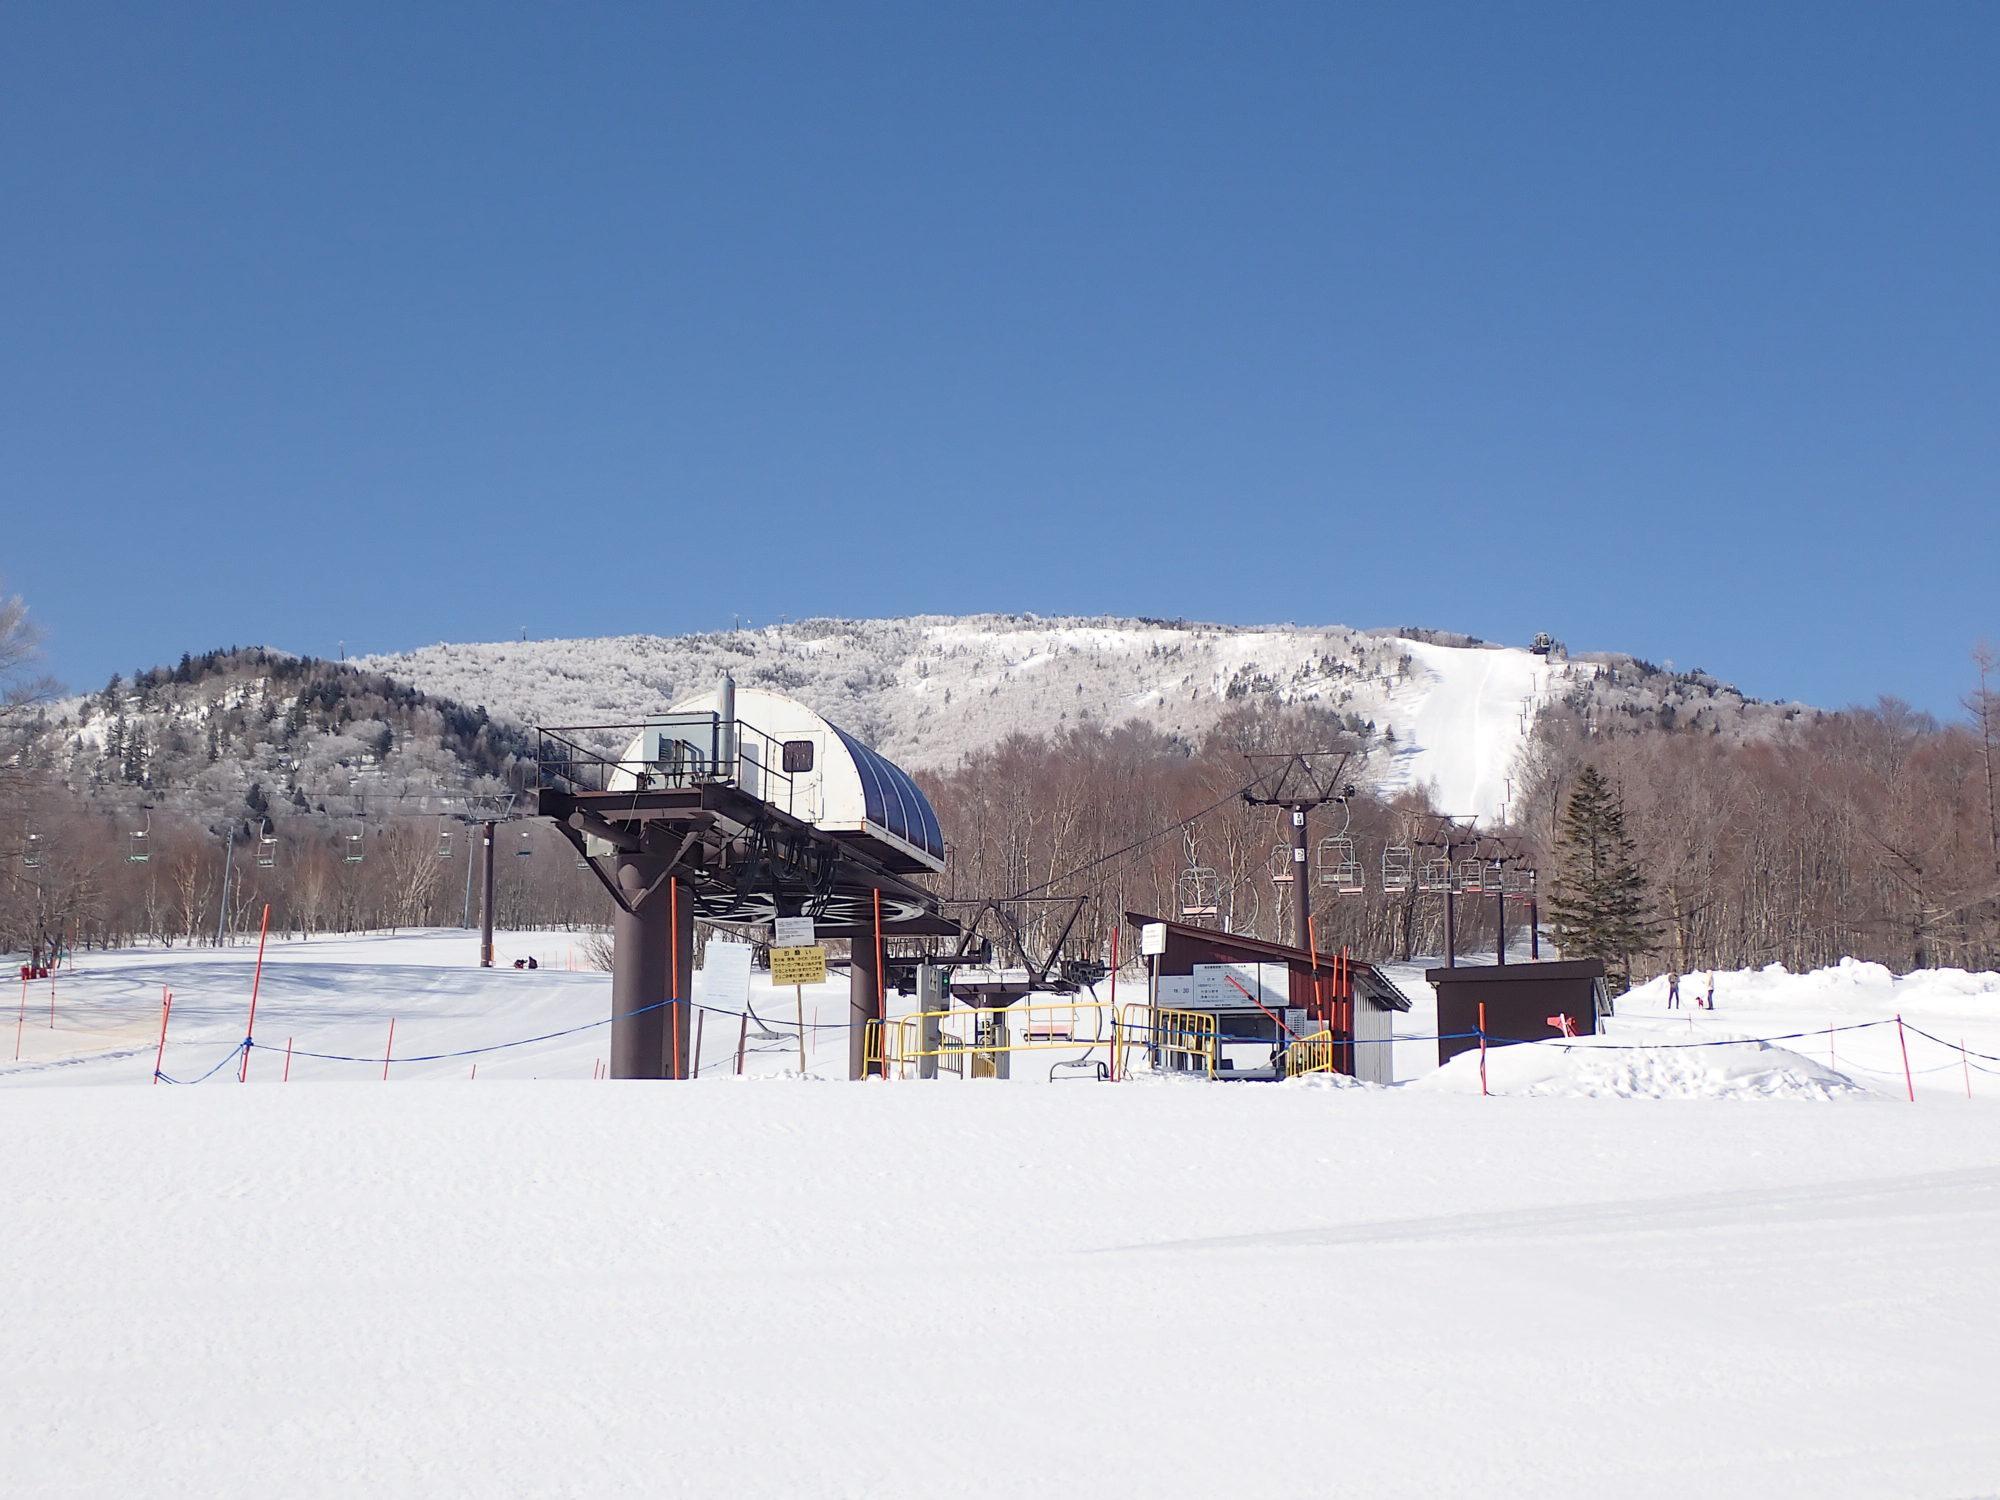 2020 mar 奥志賀の春、春スキーの奥志賀